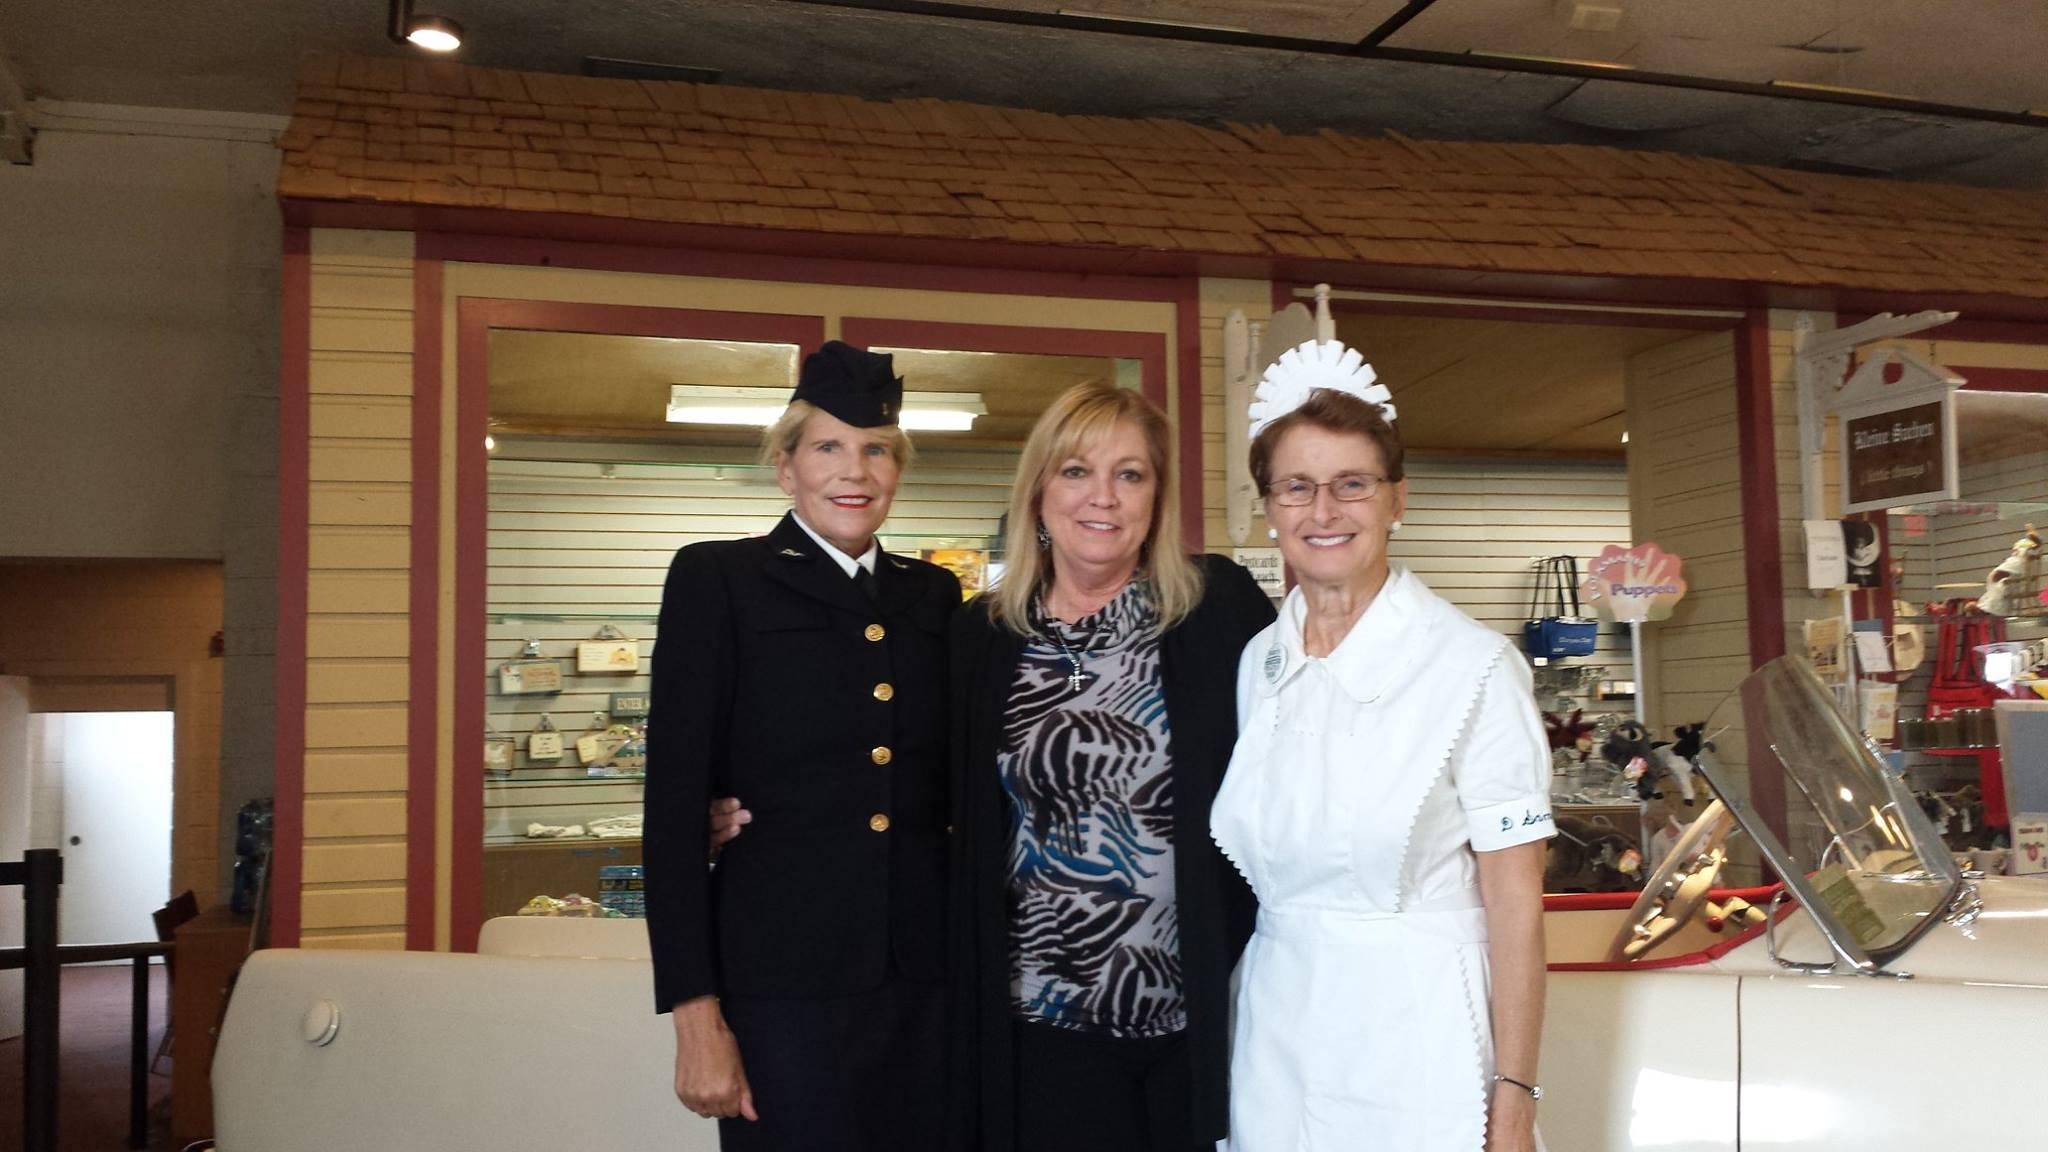 Debbie Bertolet |Fegely's Diner | Boyertown Museum |Boyertown pa